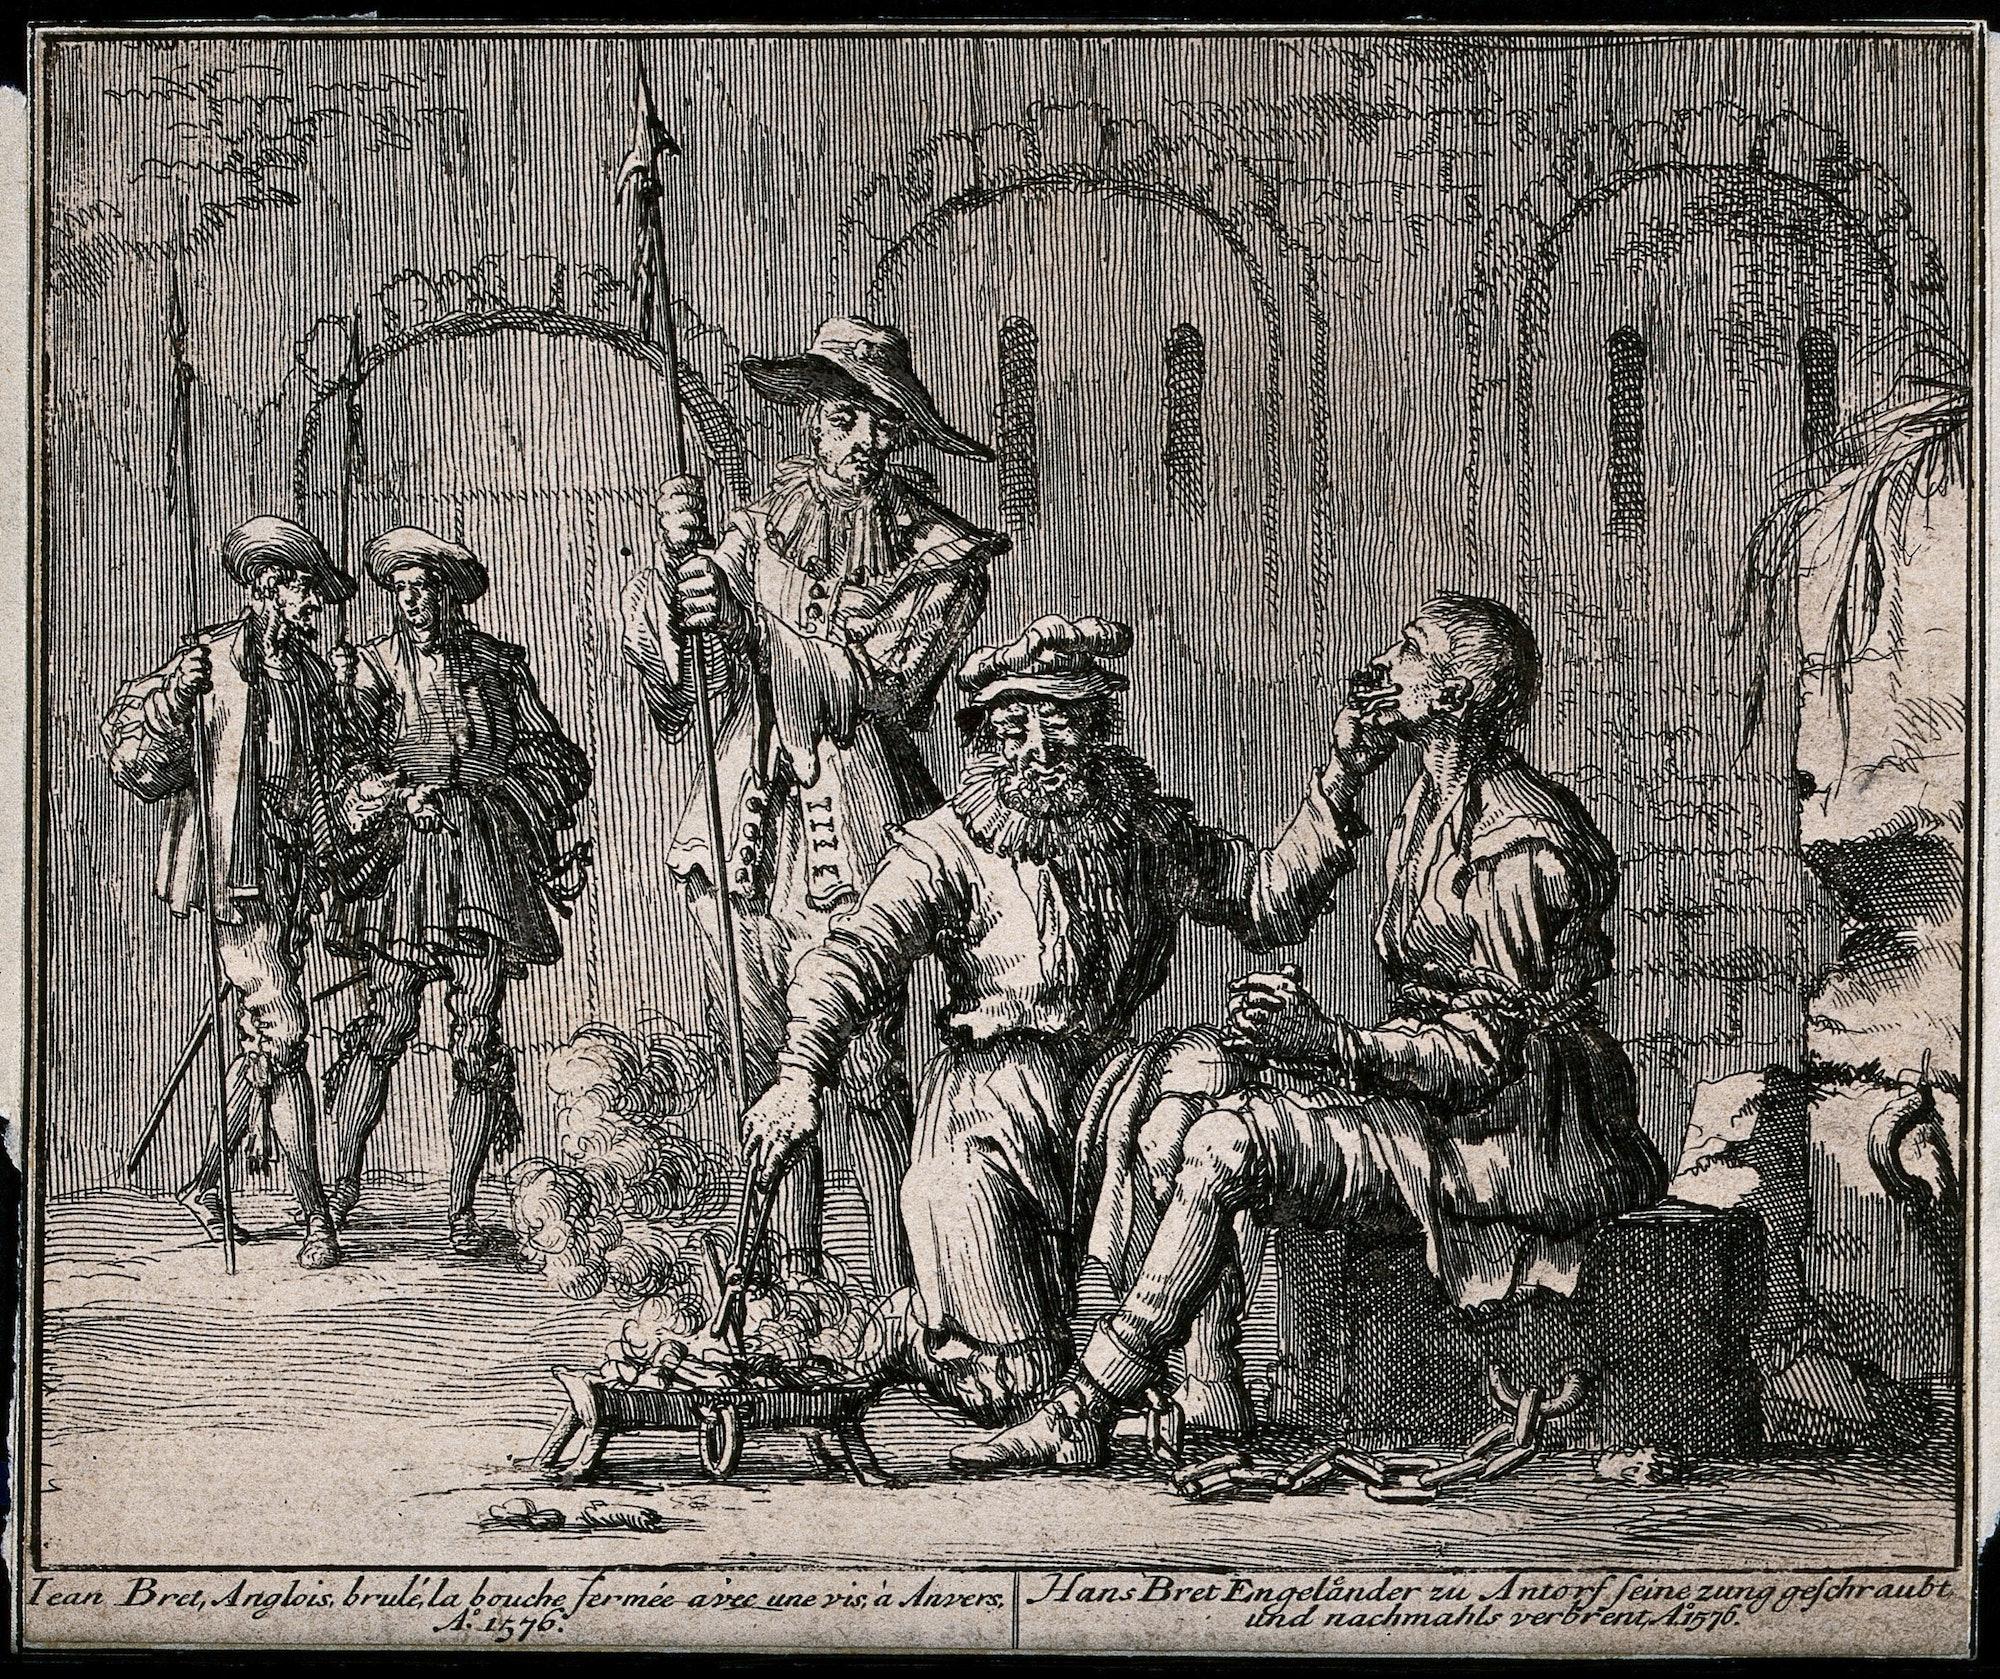 The torture of Hans Bret, an Englishman captured in Antwerp in 1576